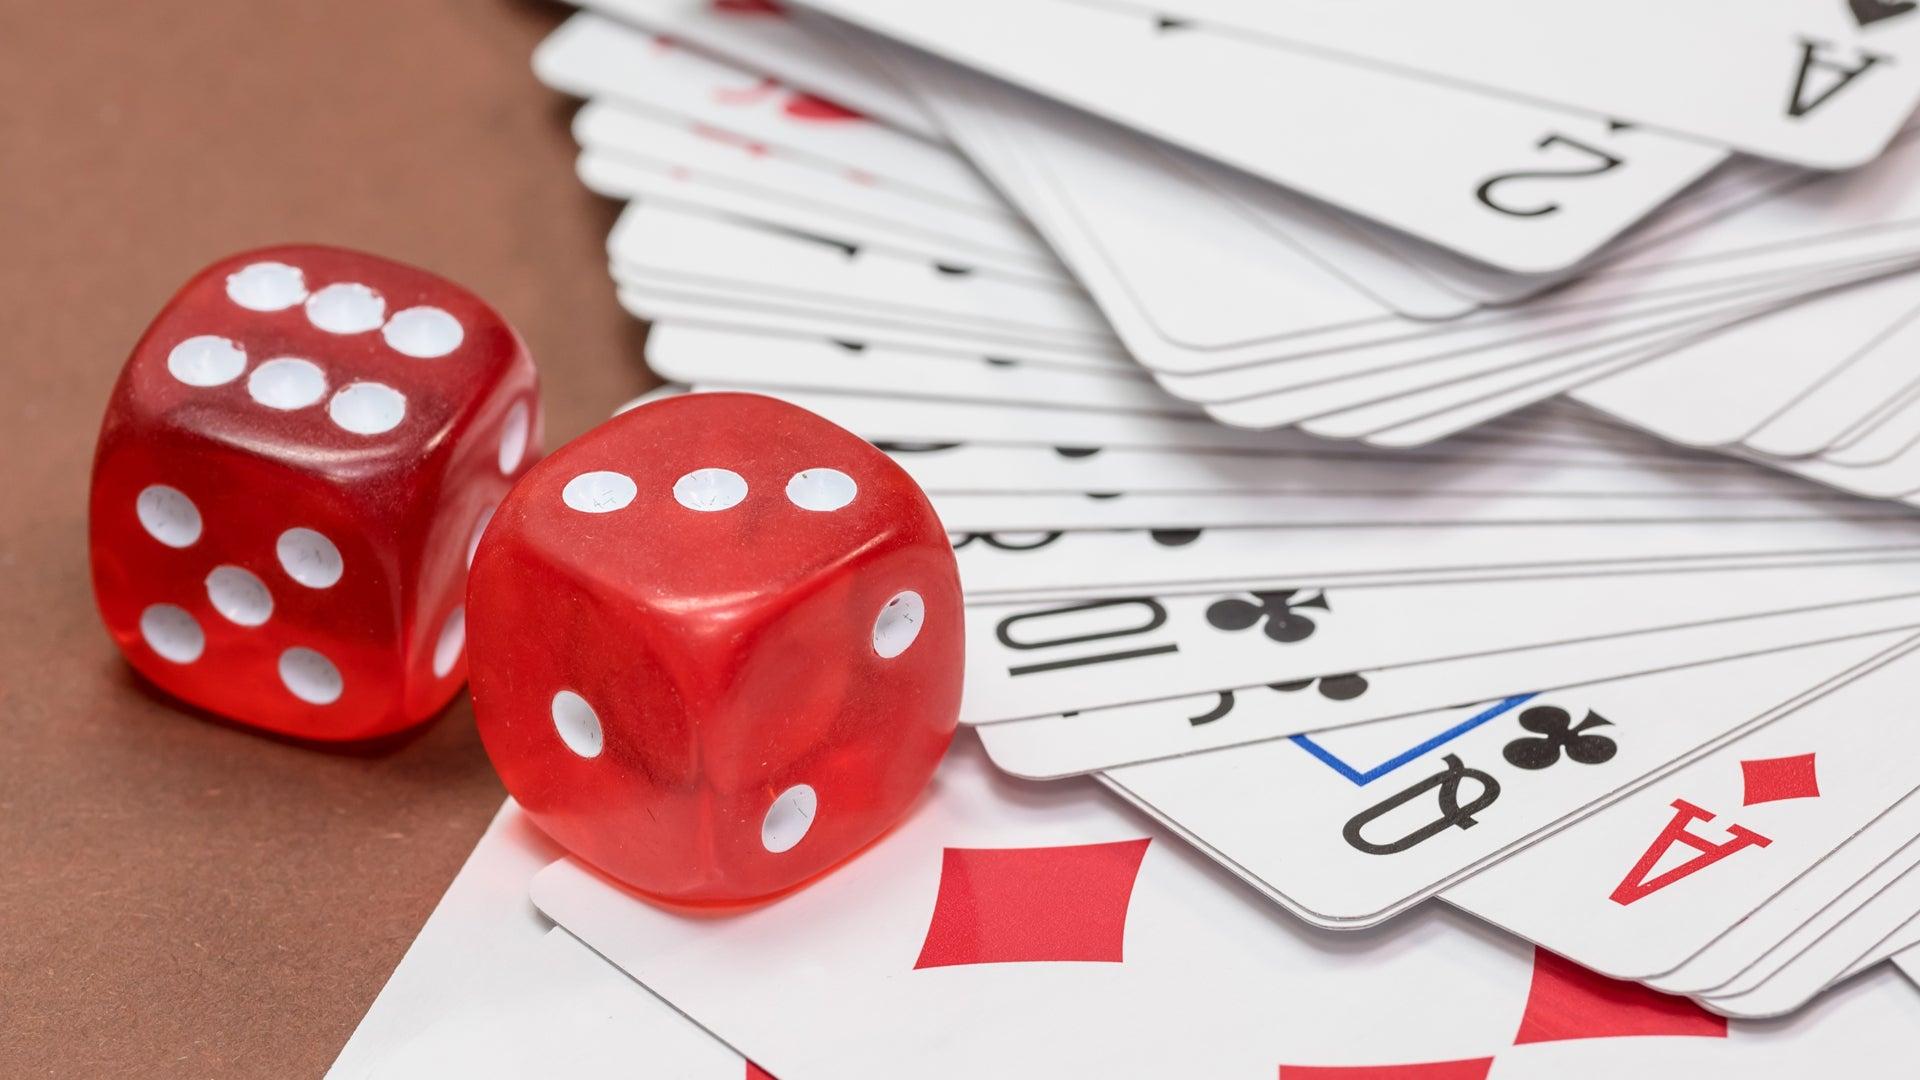 dice-playing-cards.jpg